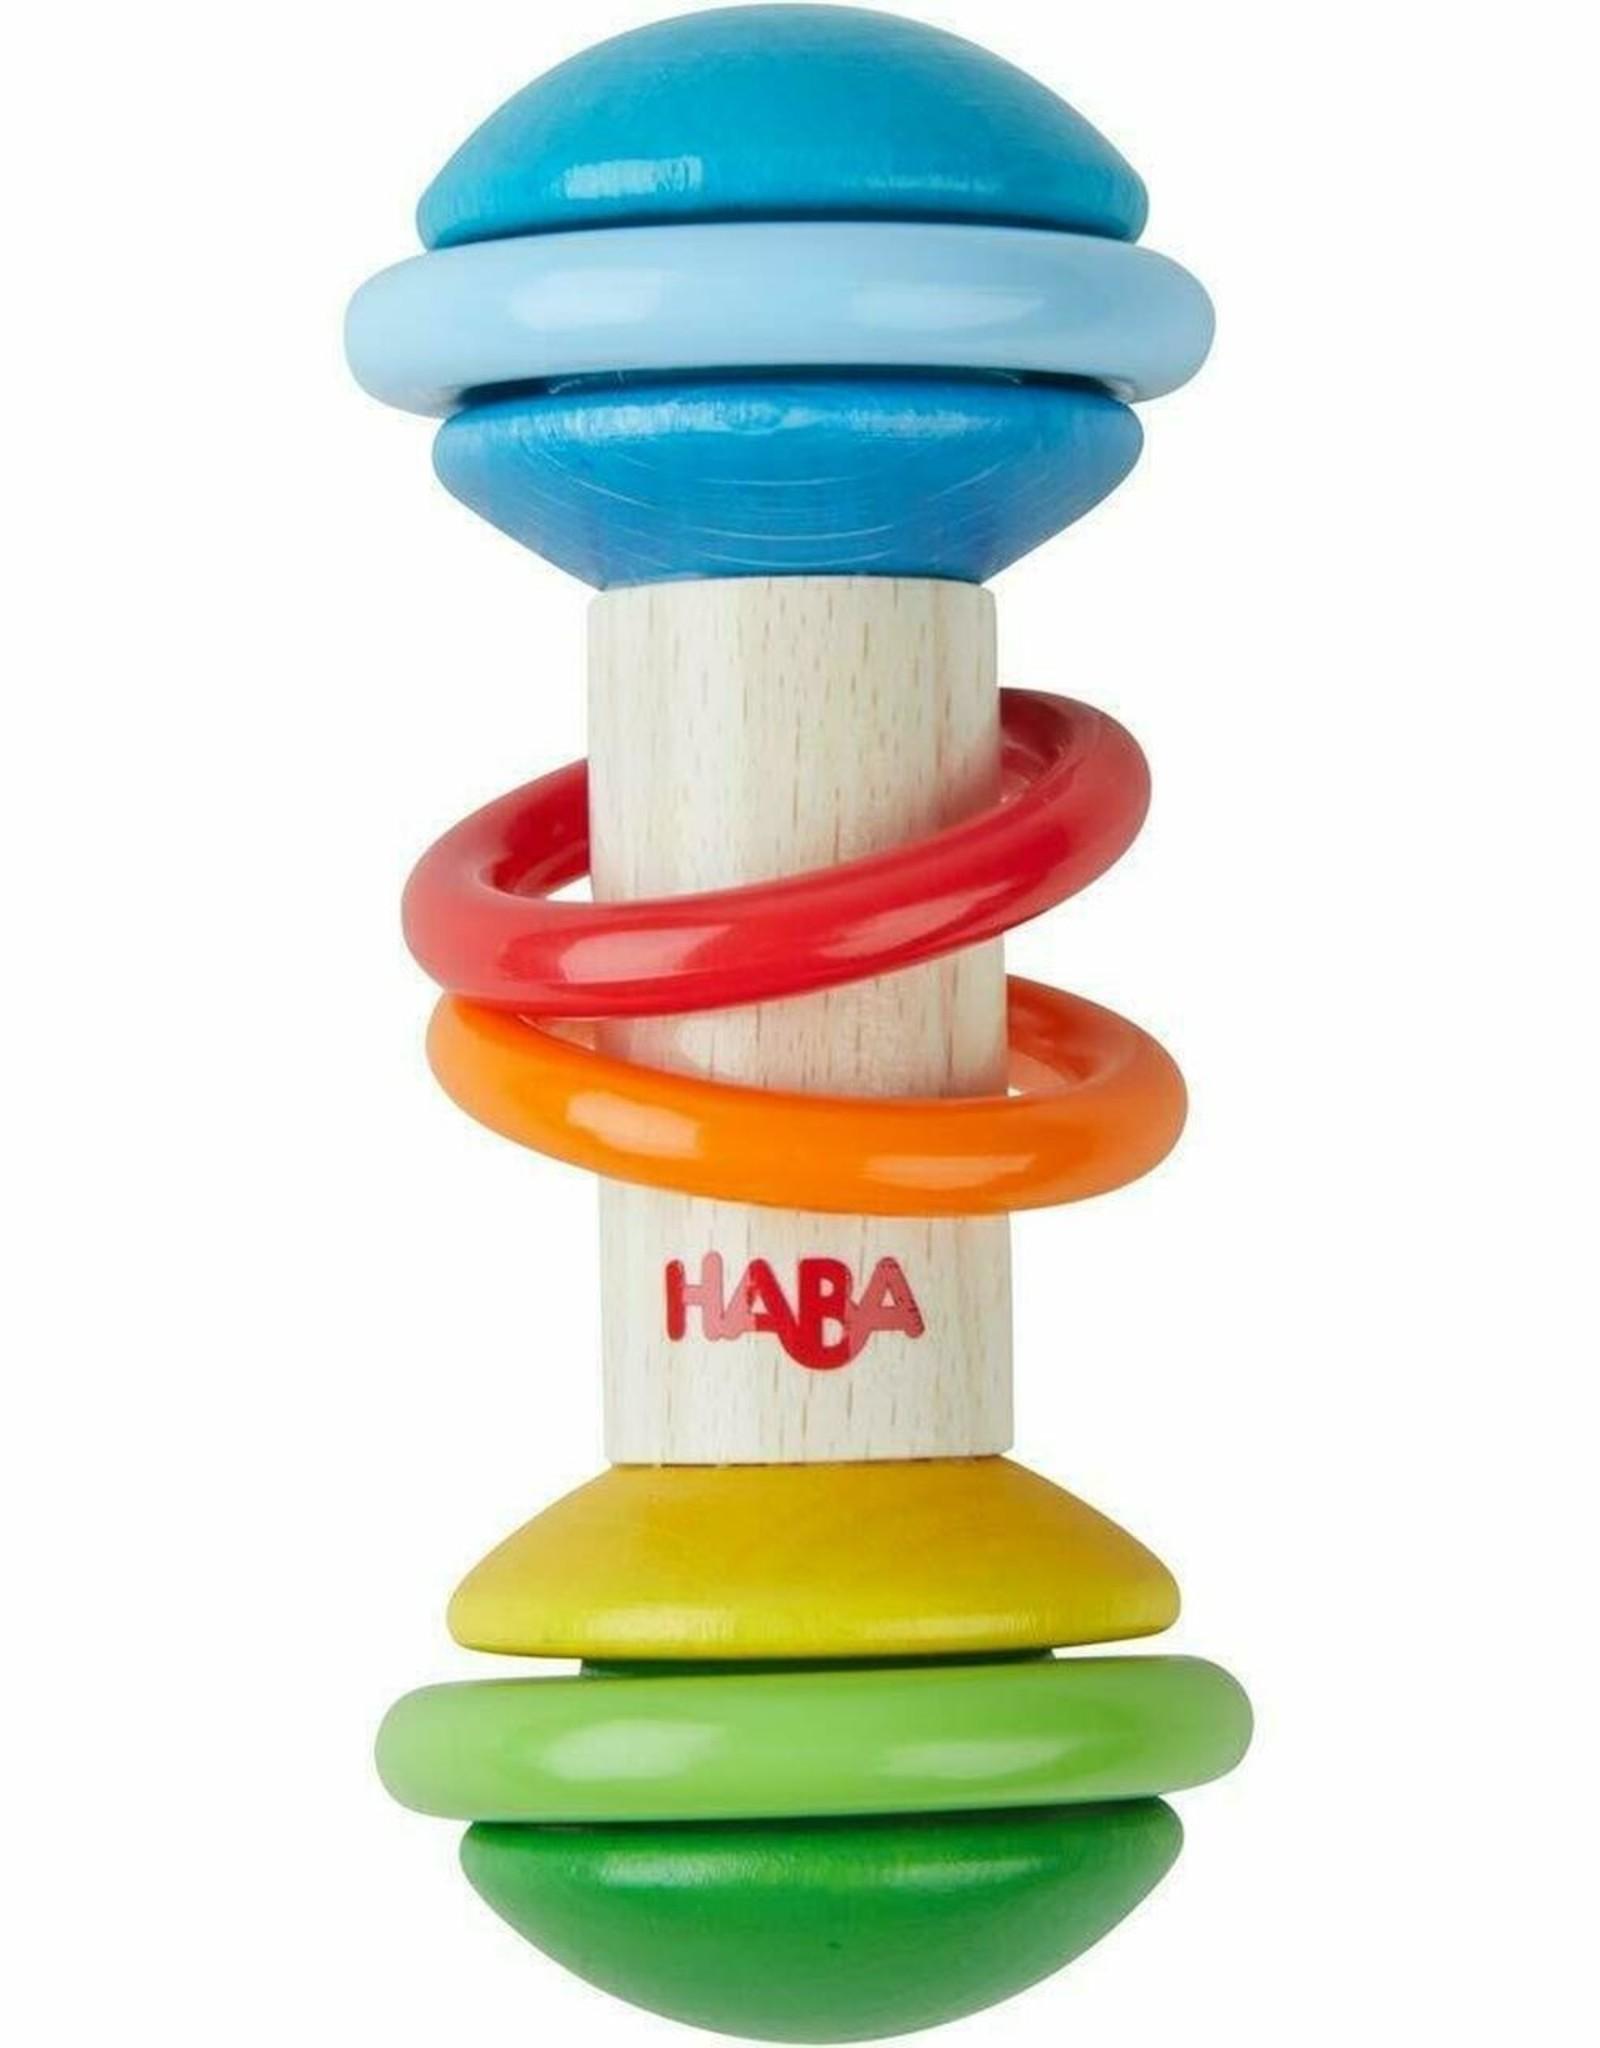 Haba rainmaker clutching toy